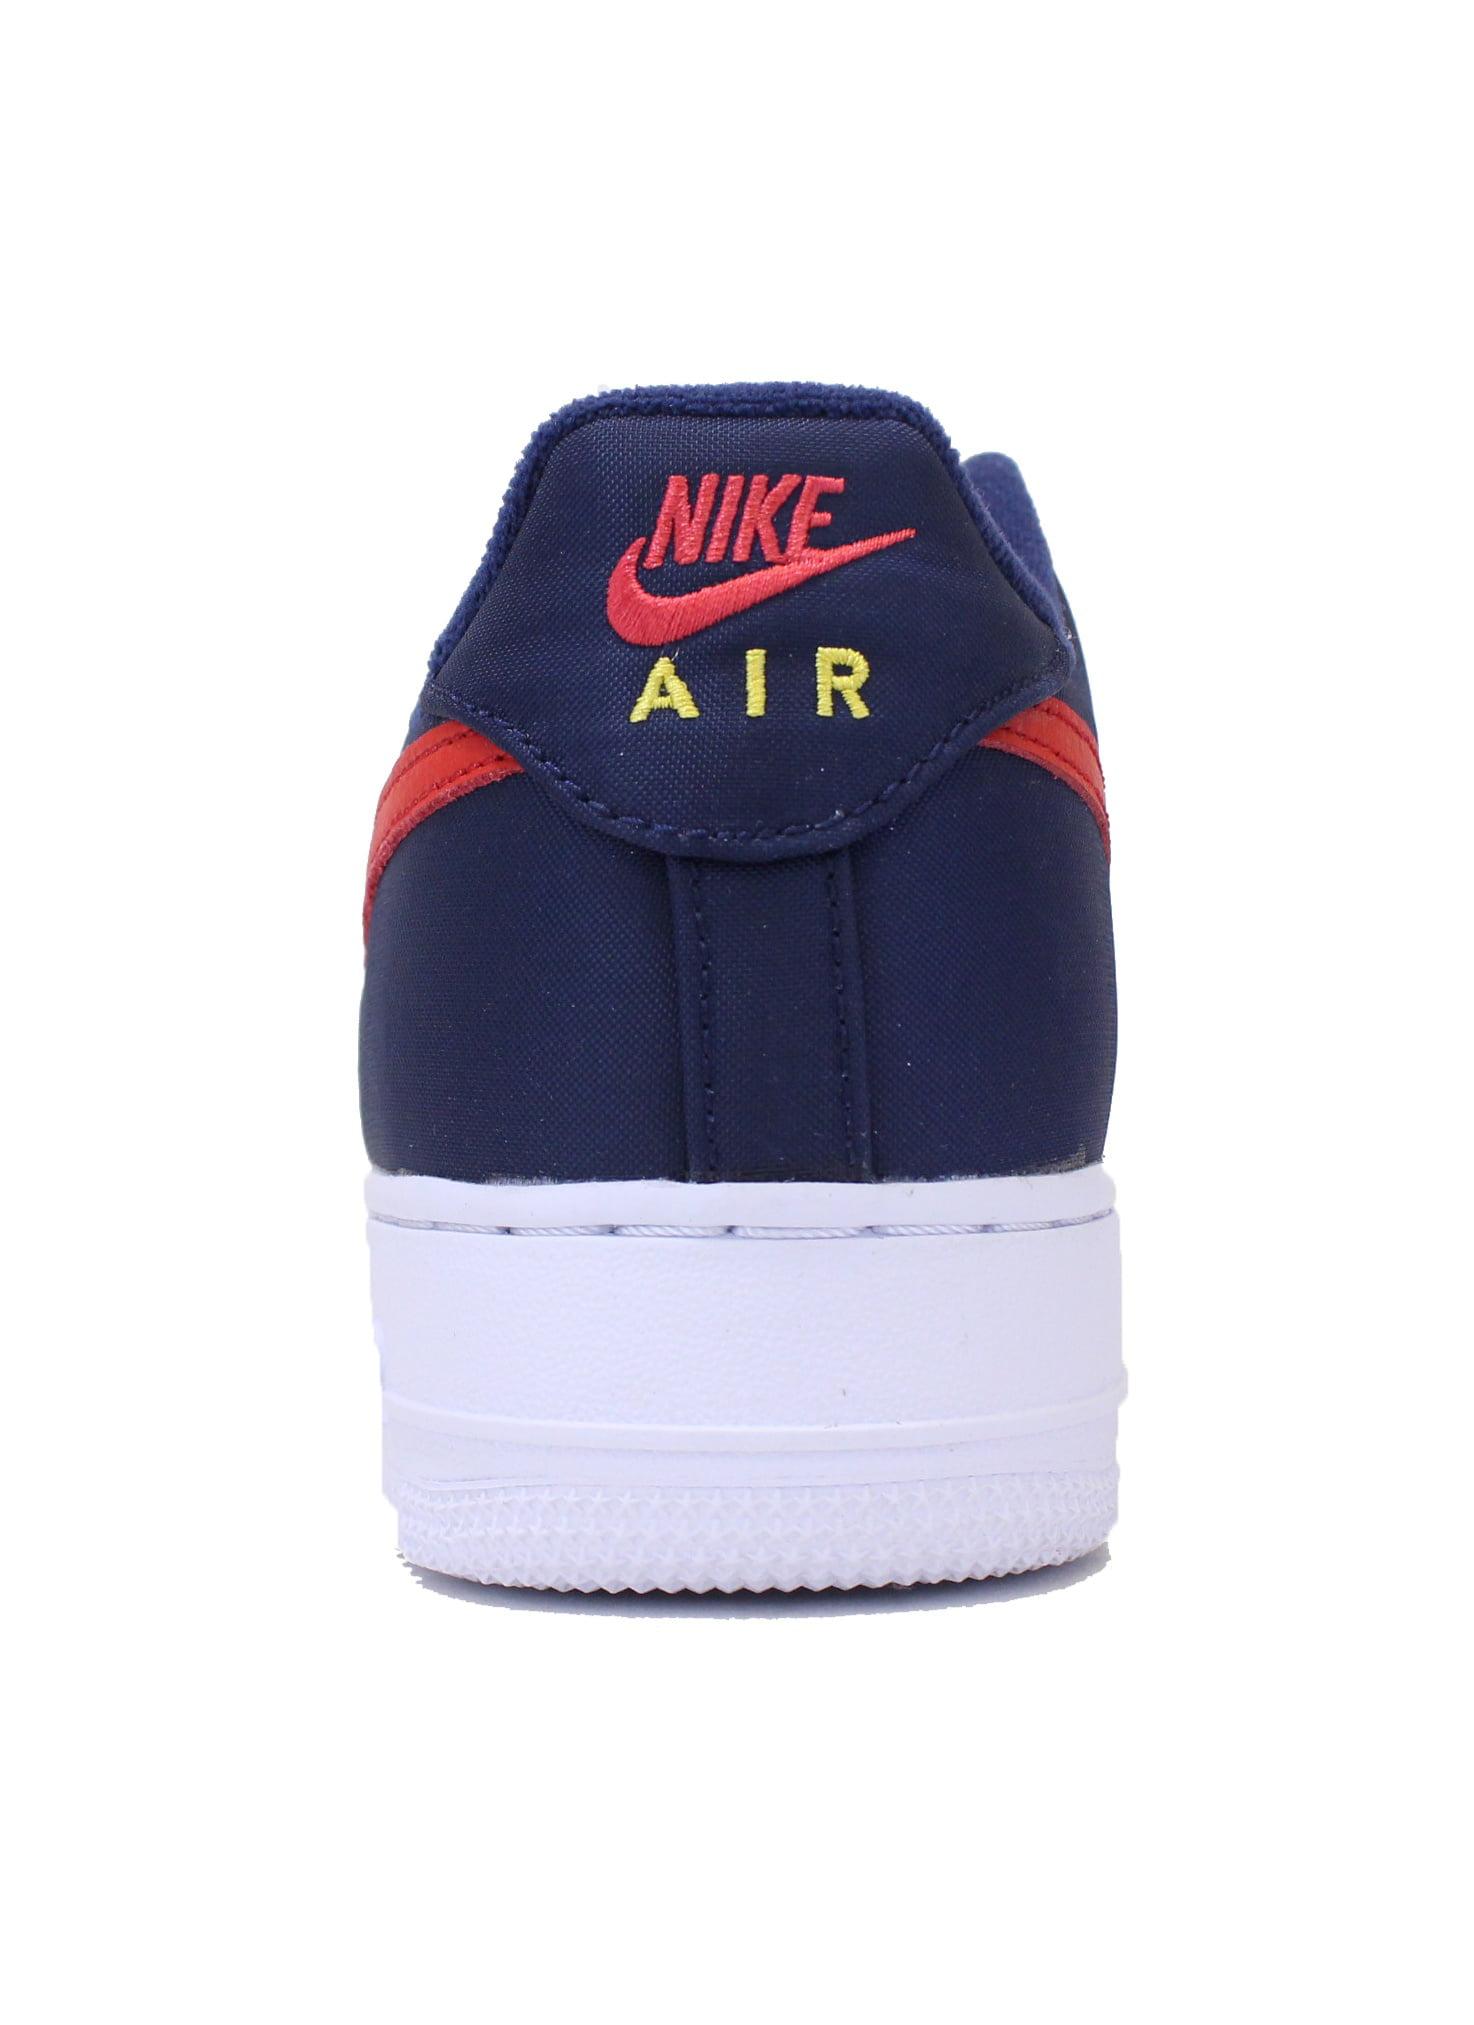 sports shoes a8963 d0a8e Nike - Nike Air Force 1 07 LV8 Men s Shoes University Red Universite Rogue  823511-601 - Walmart.com